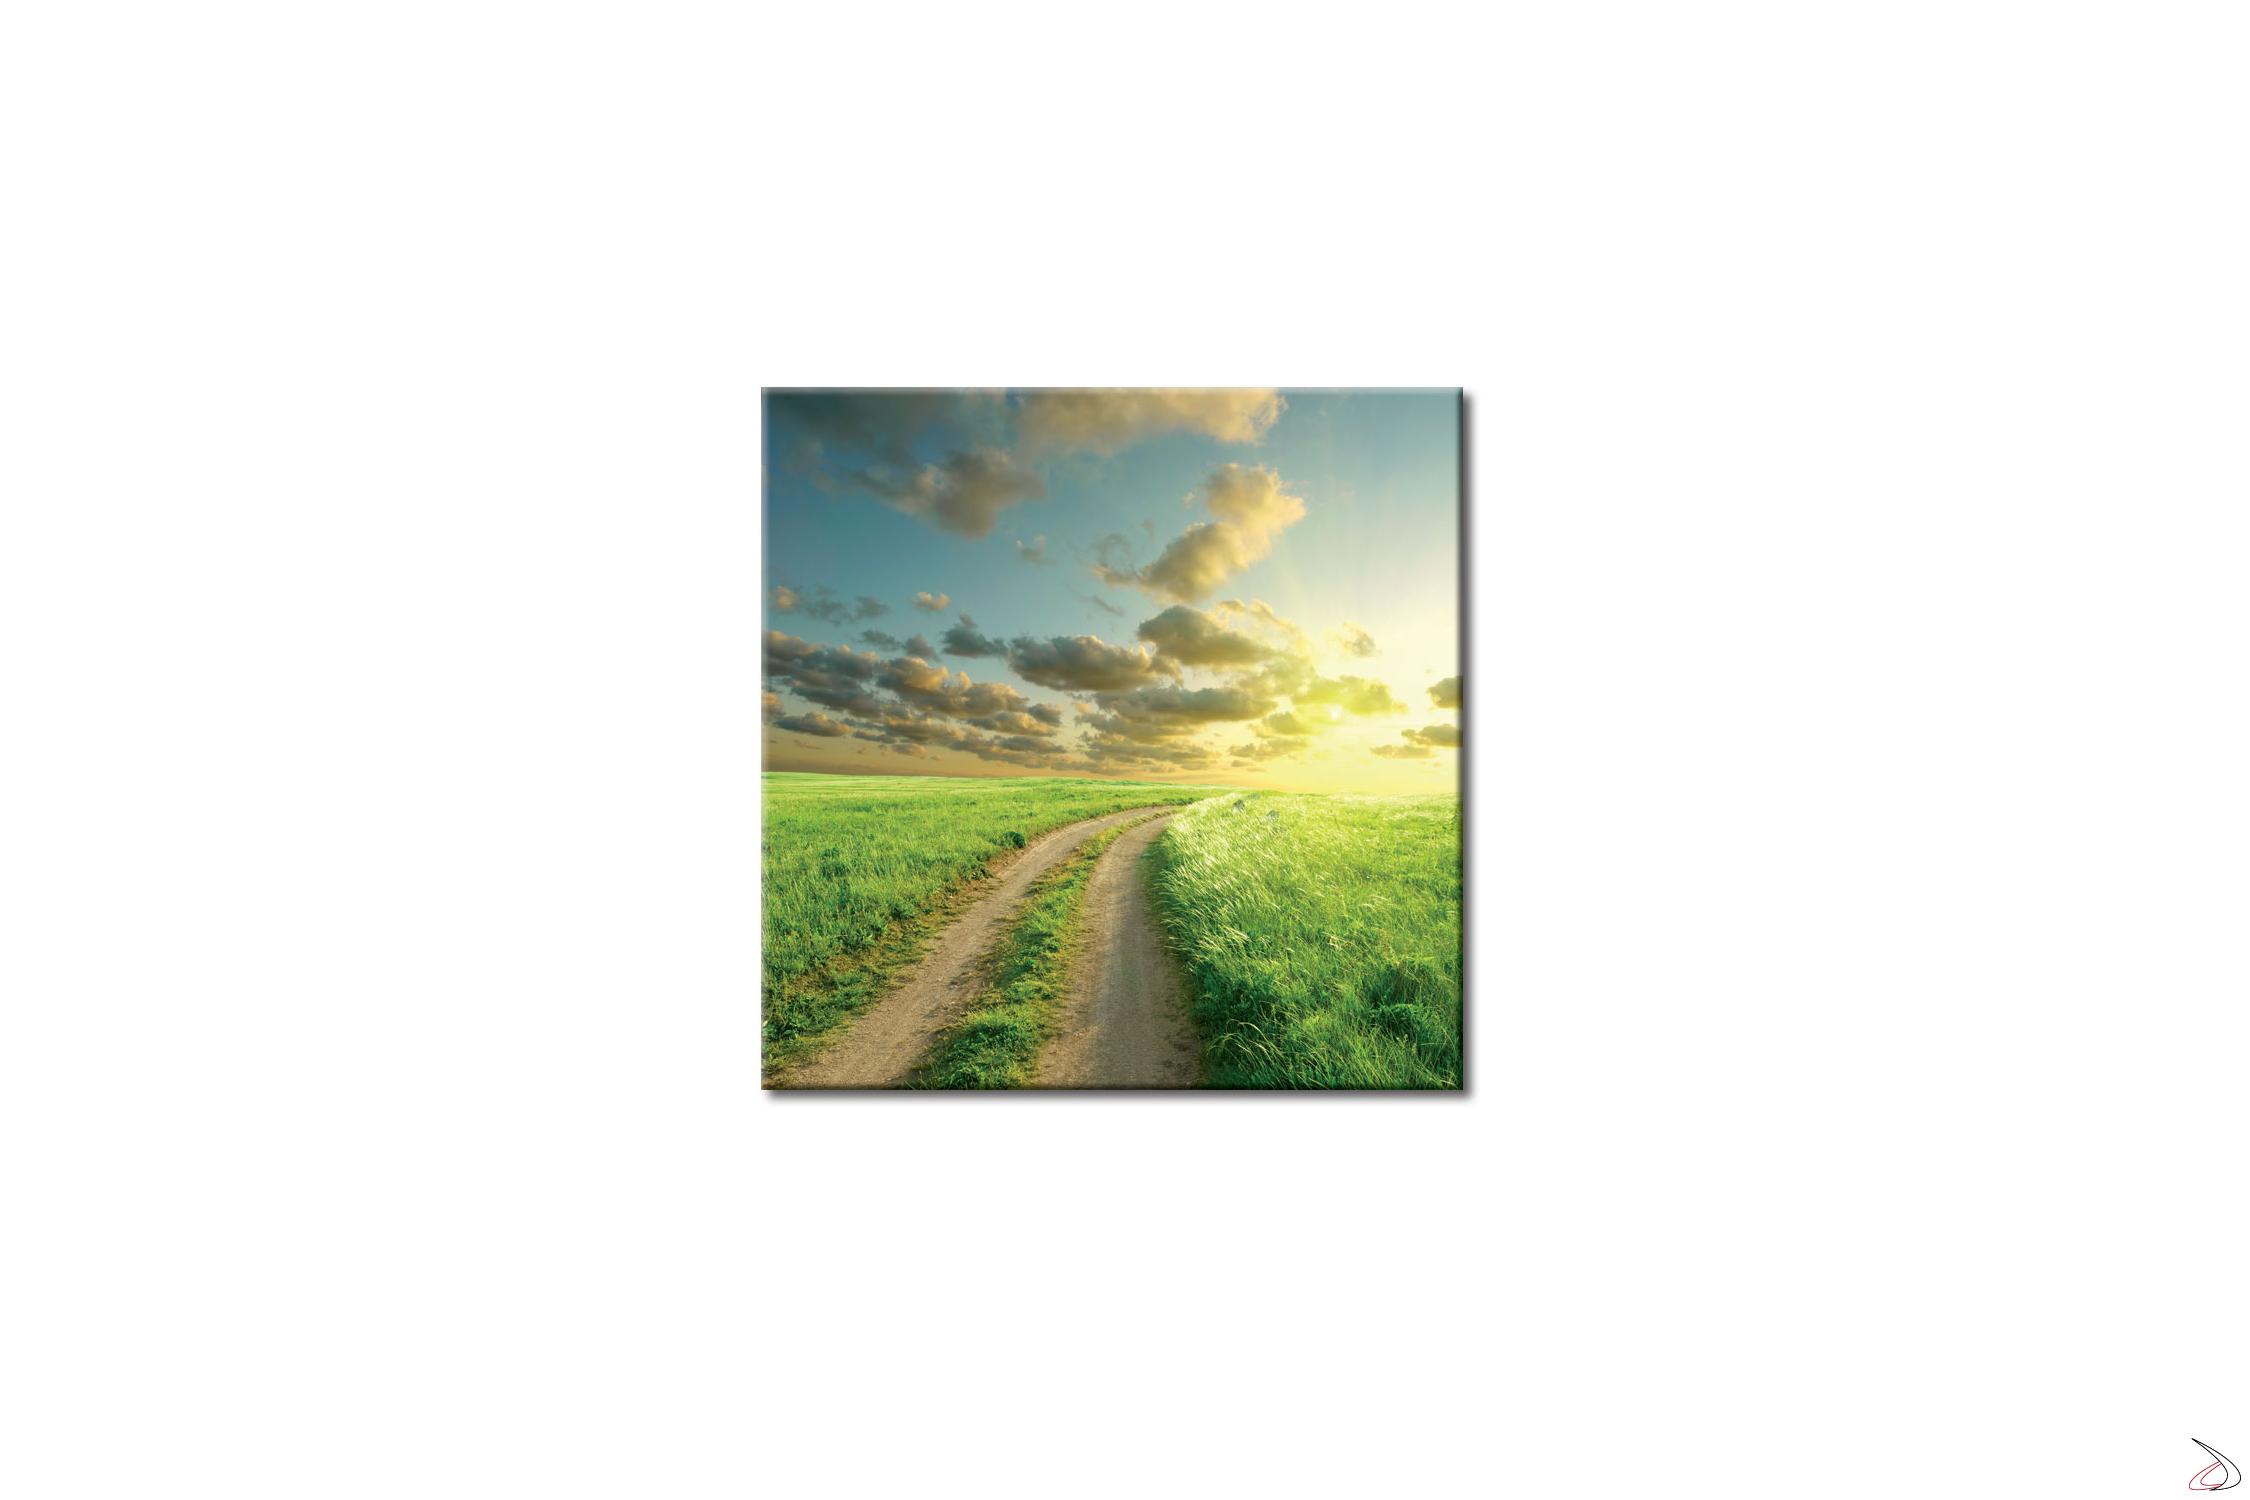 Quadri Classici Per Arredamento quadro paesaggi, sentieri